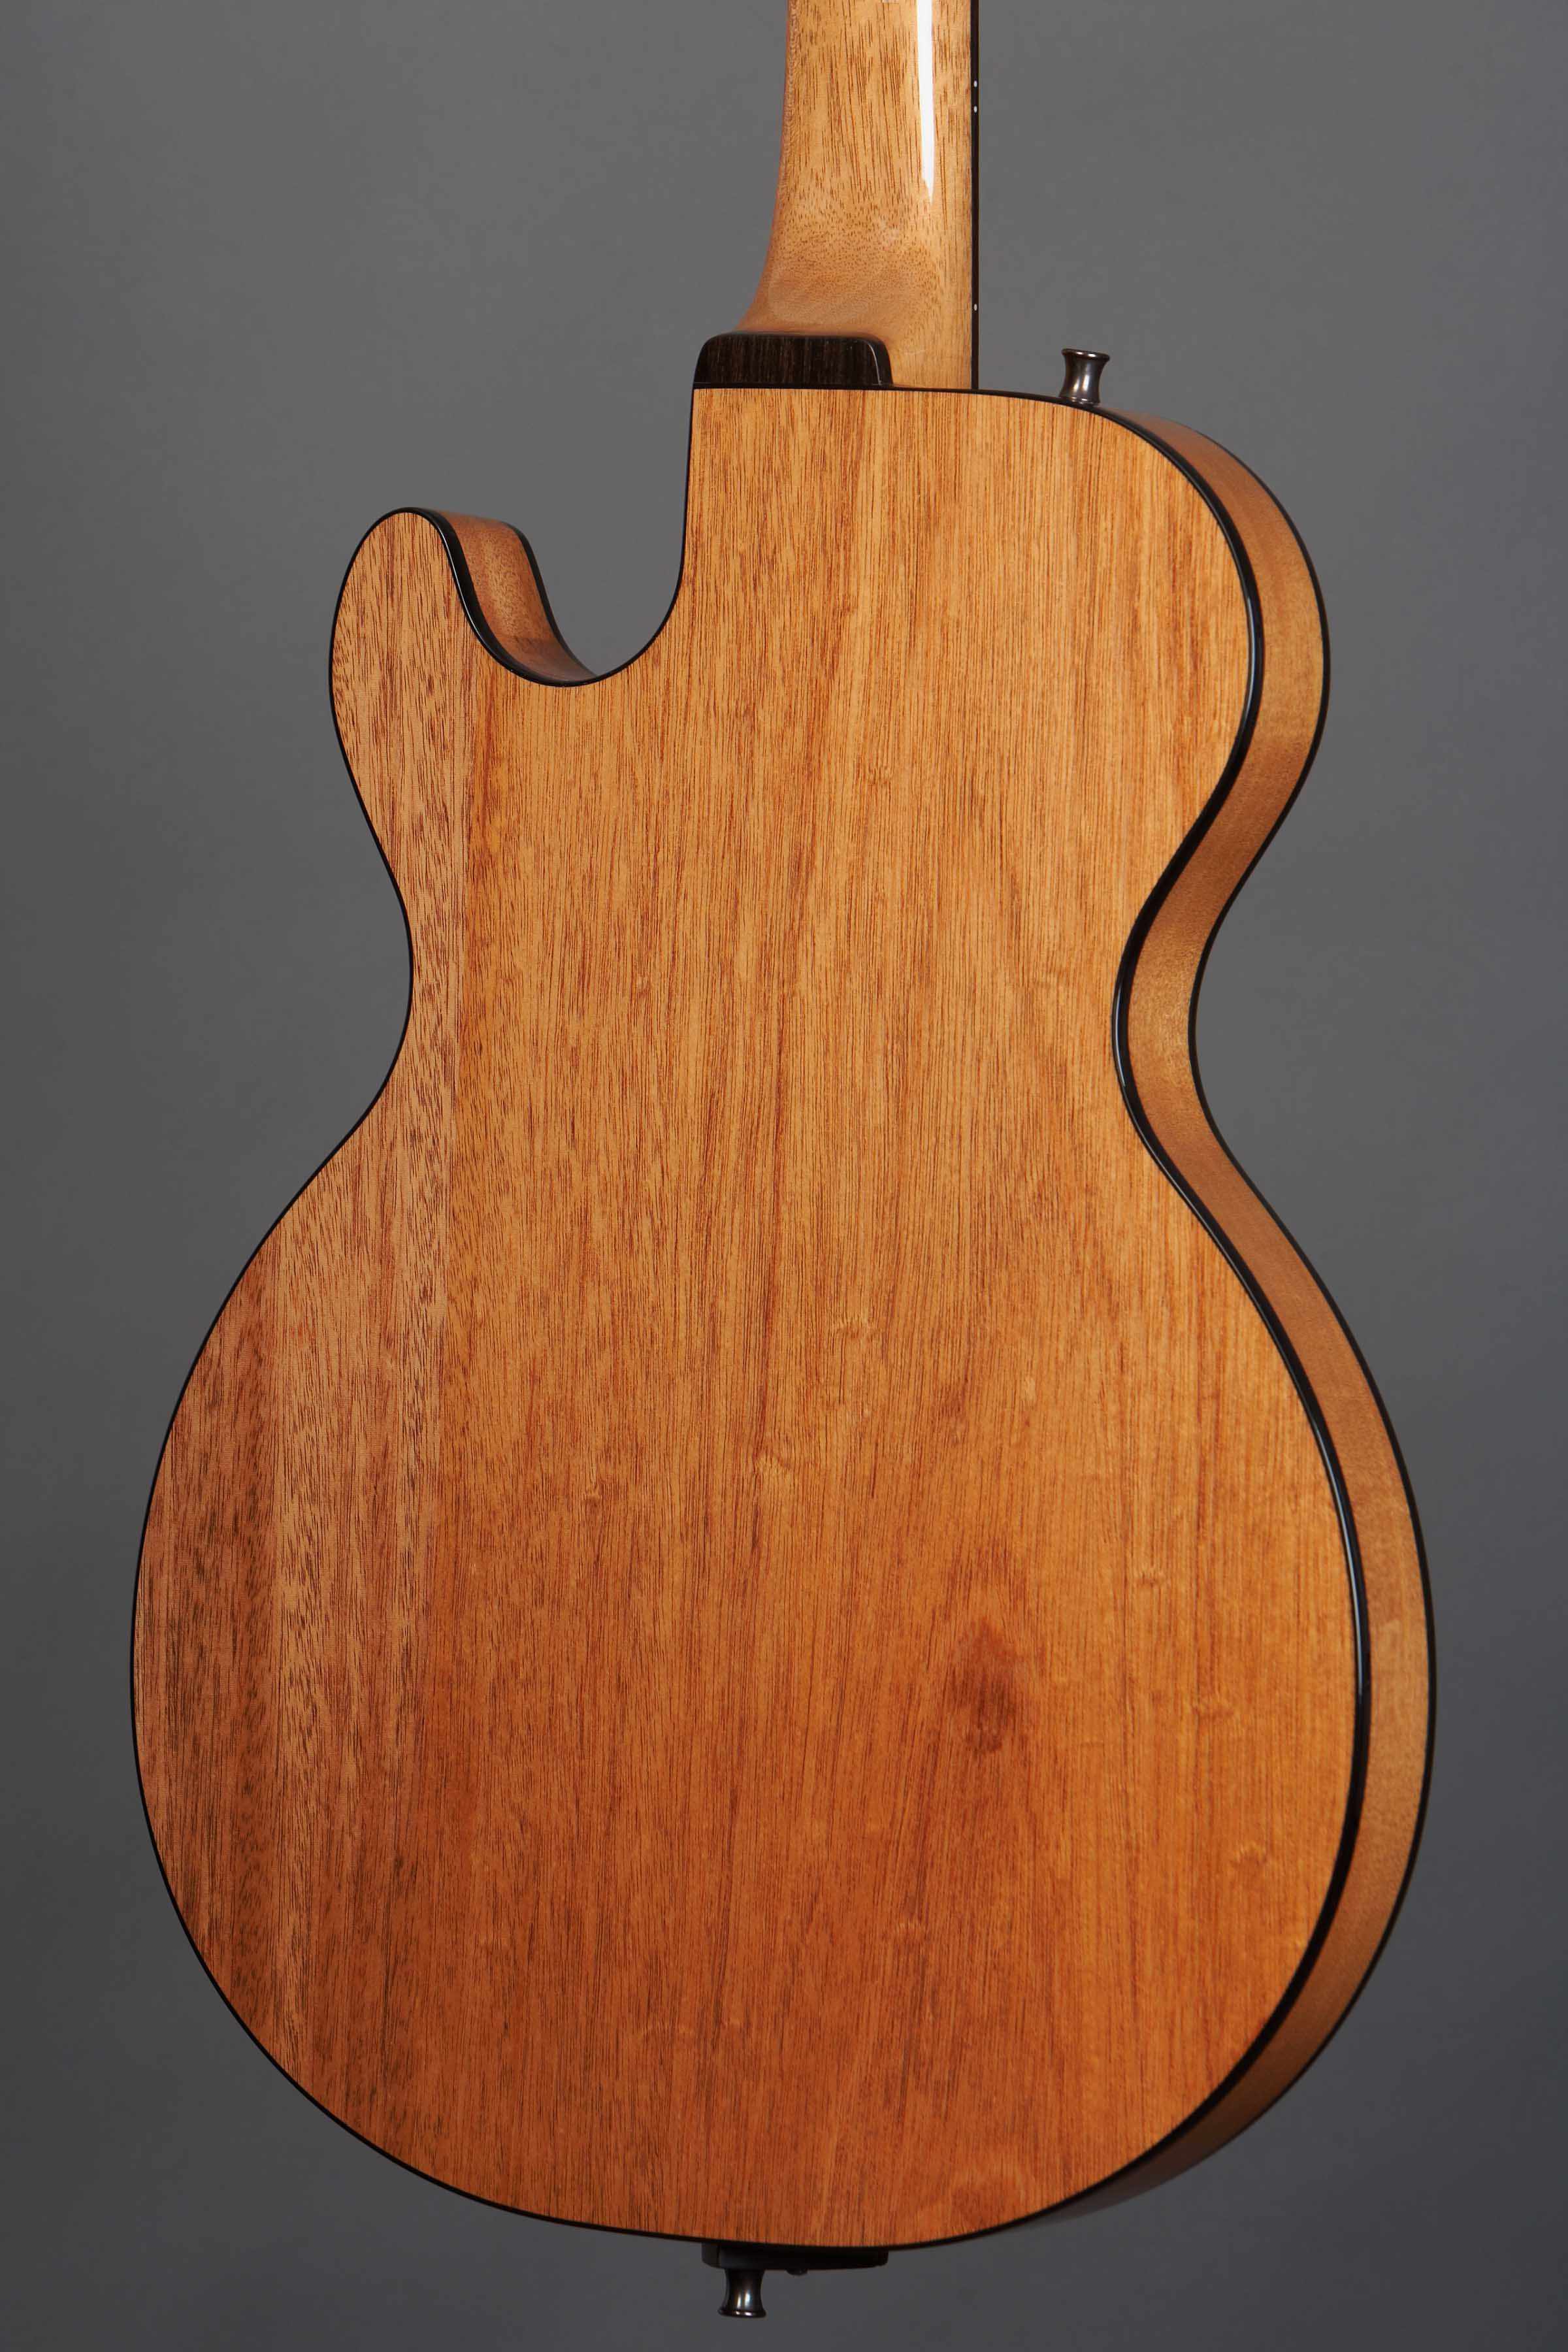 Demers voodoo hybrid jazz archtop electric guitarmaker montreal